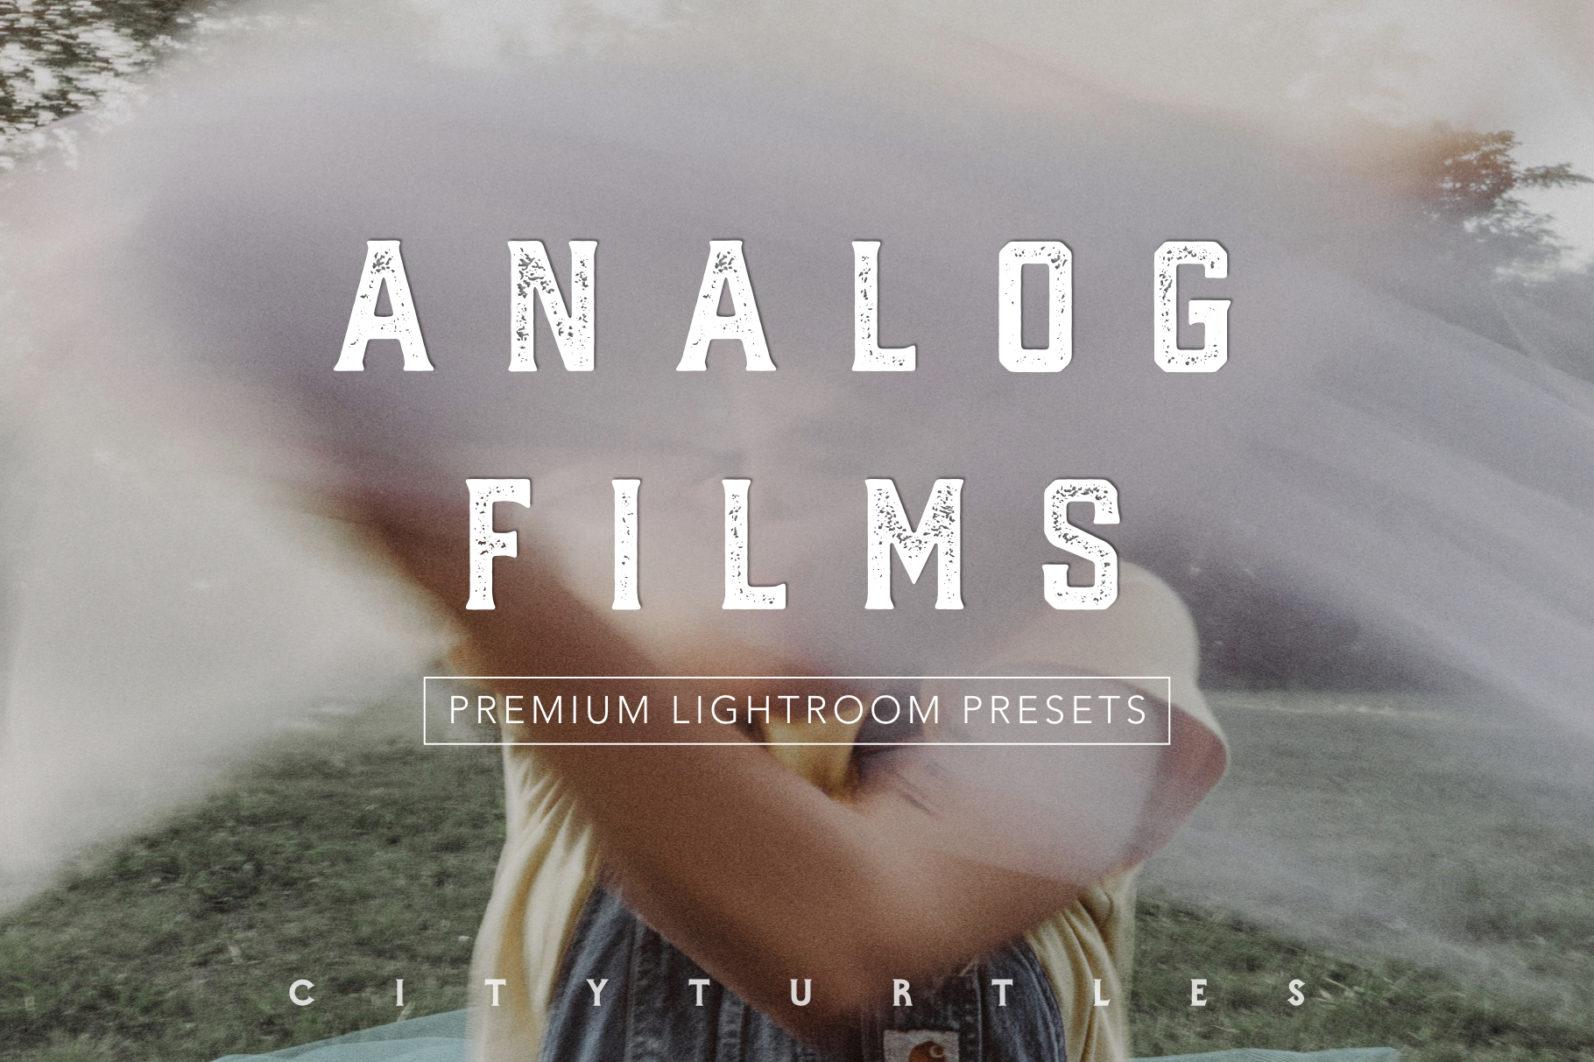 ANALOG FILM Inspired Moody Lightroom Presets for Desktop & Mobile - analog film.001 -